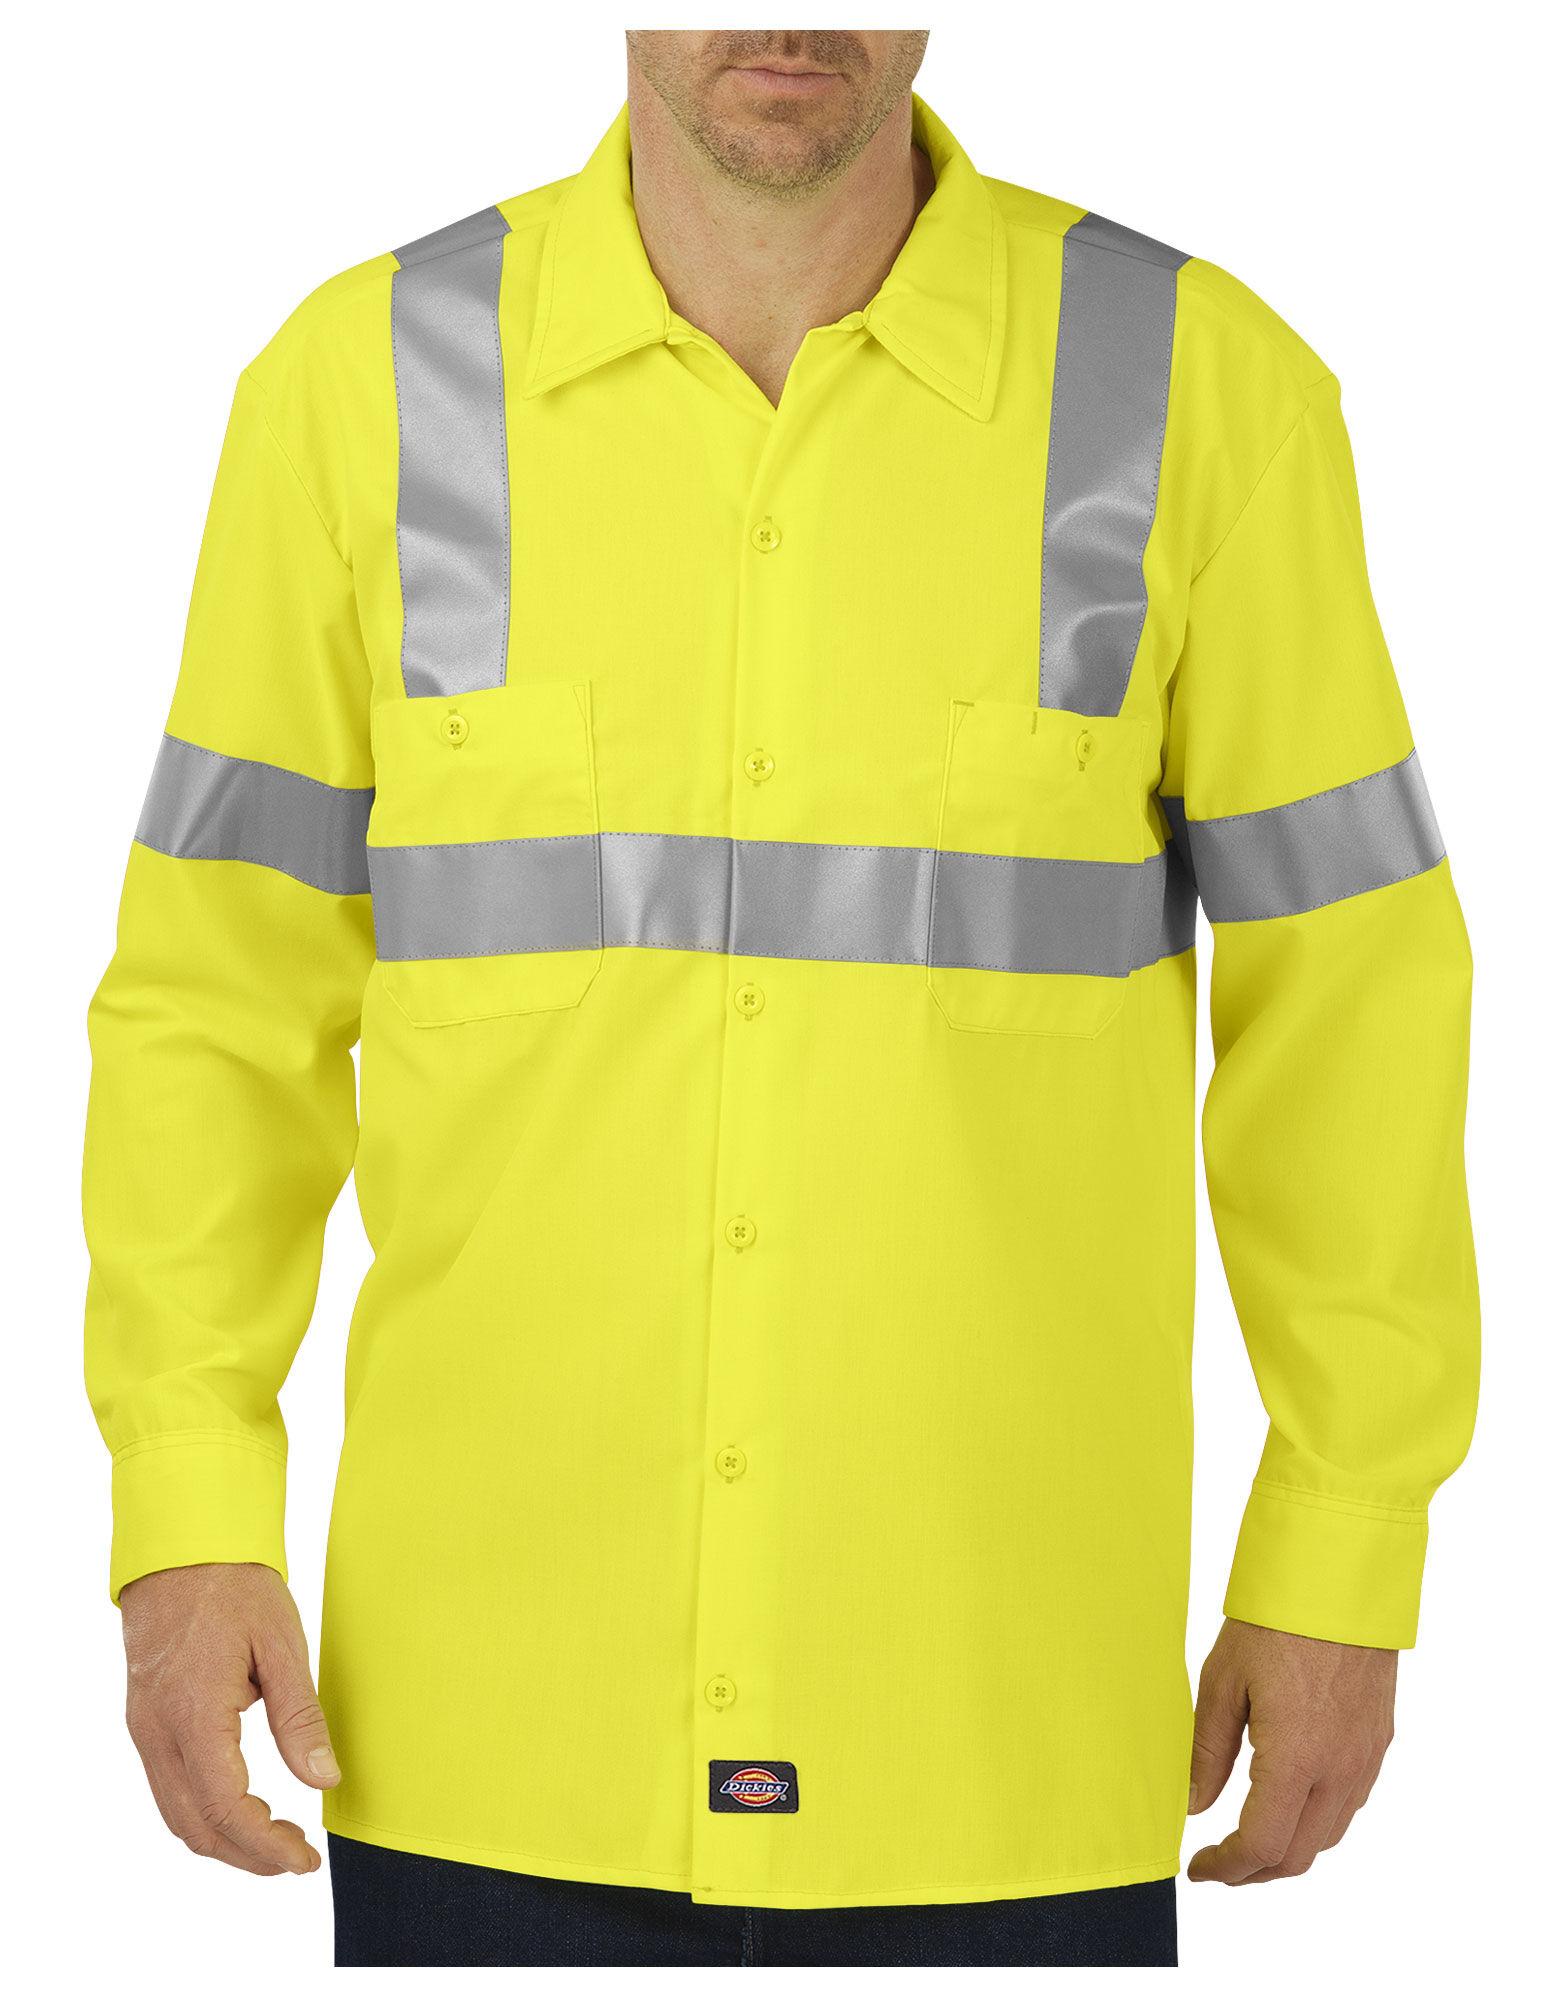 high visibility ansi class 2 long sleeve work shirt mens